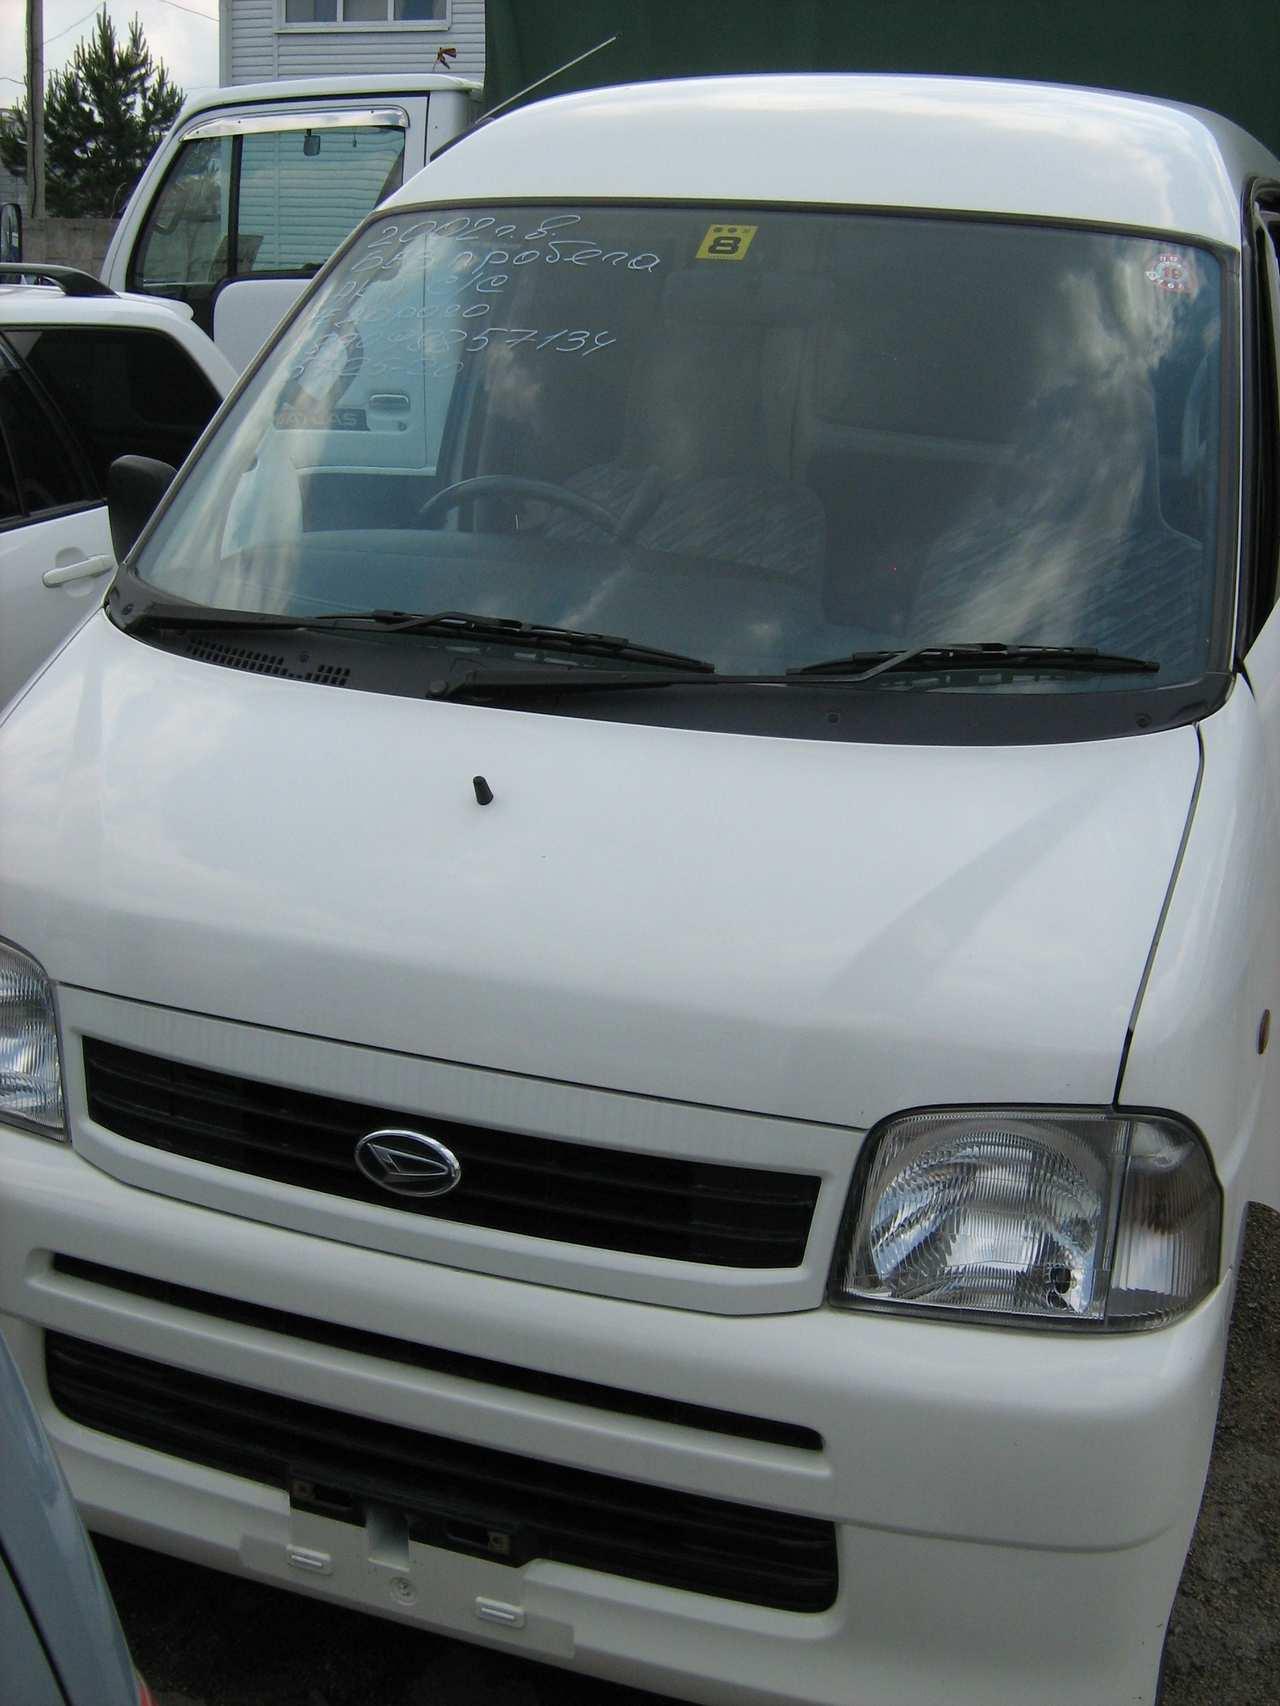 2002 Daihatsu Hijet Pictures 0 7l Gasoline Fr Or Rr